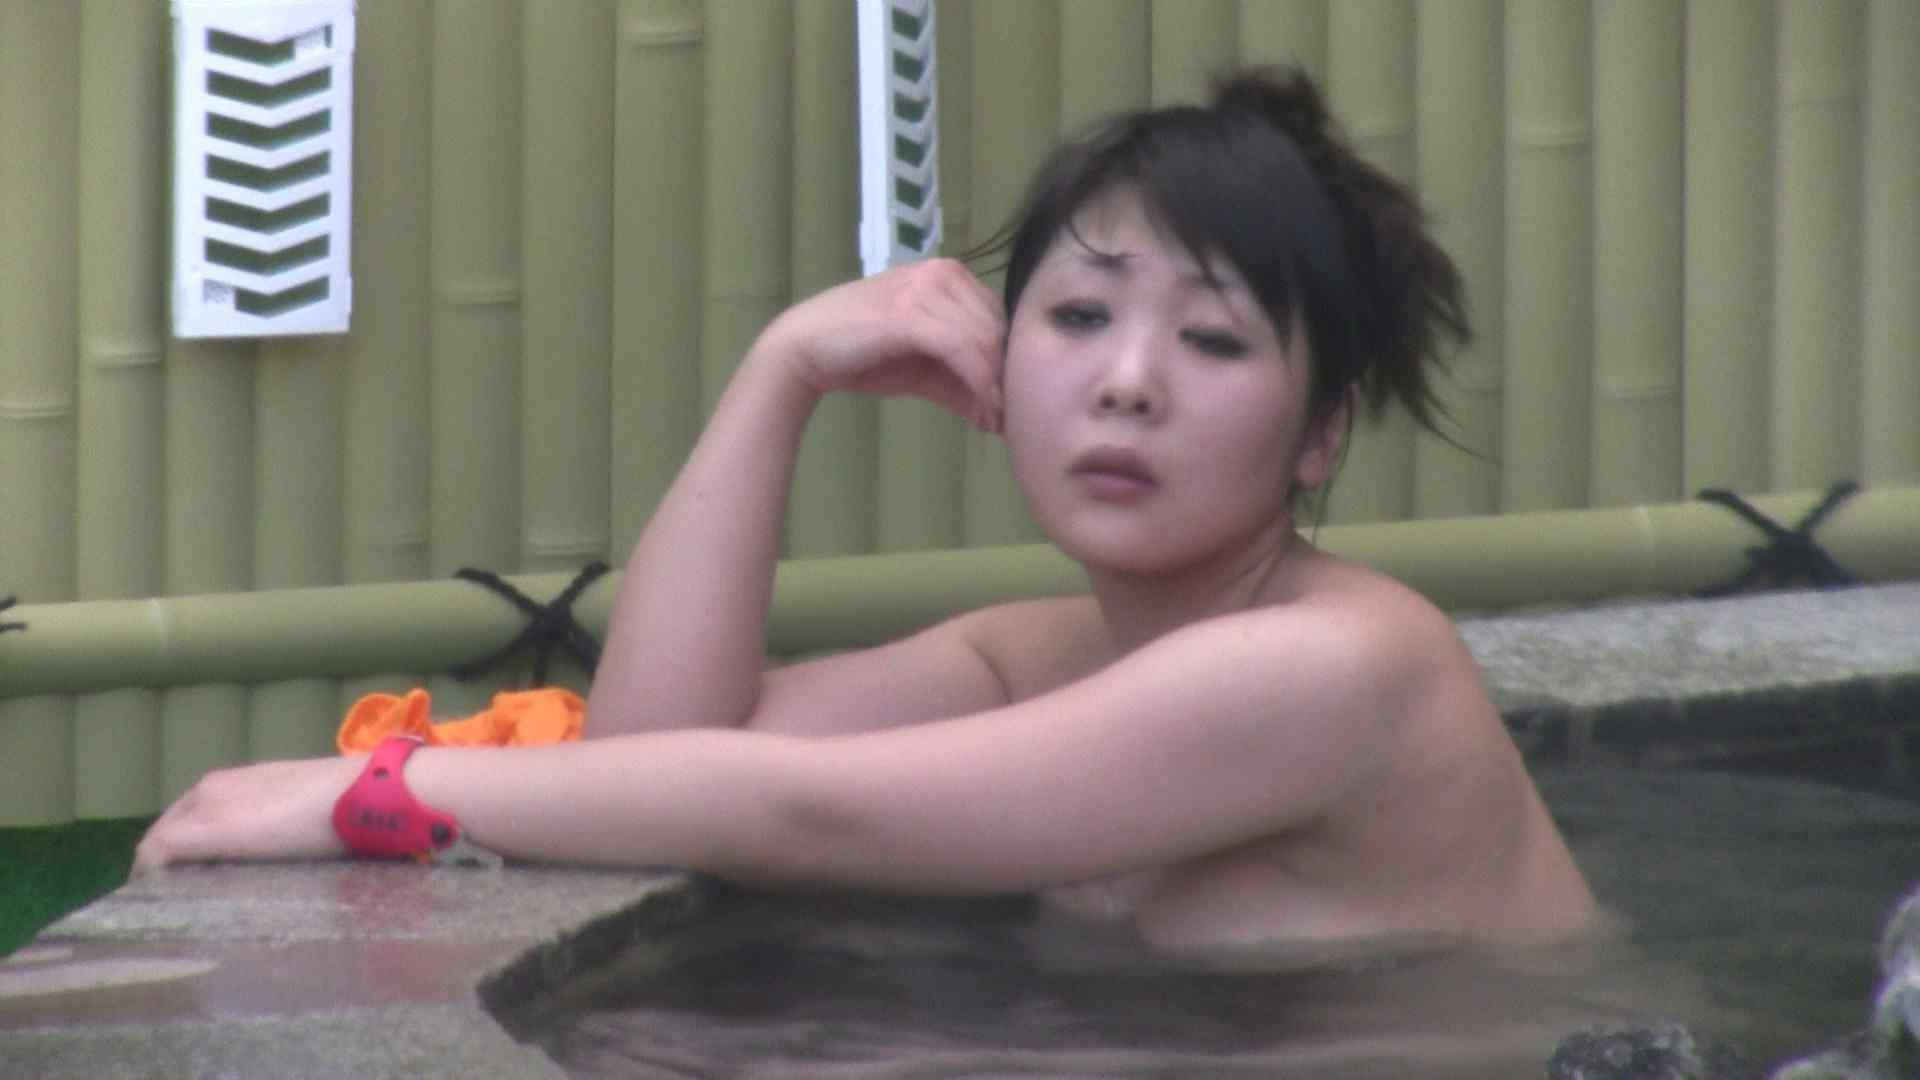 Aquaな露天風呂Vol.118 OL女体 | 露天  68連発 67